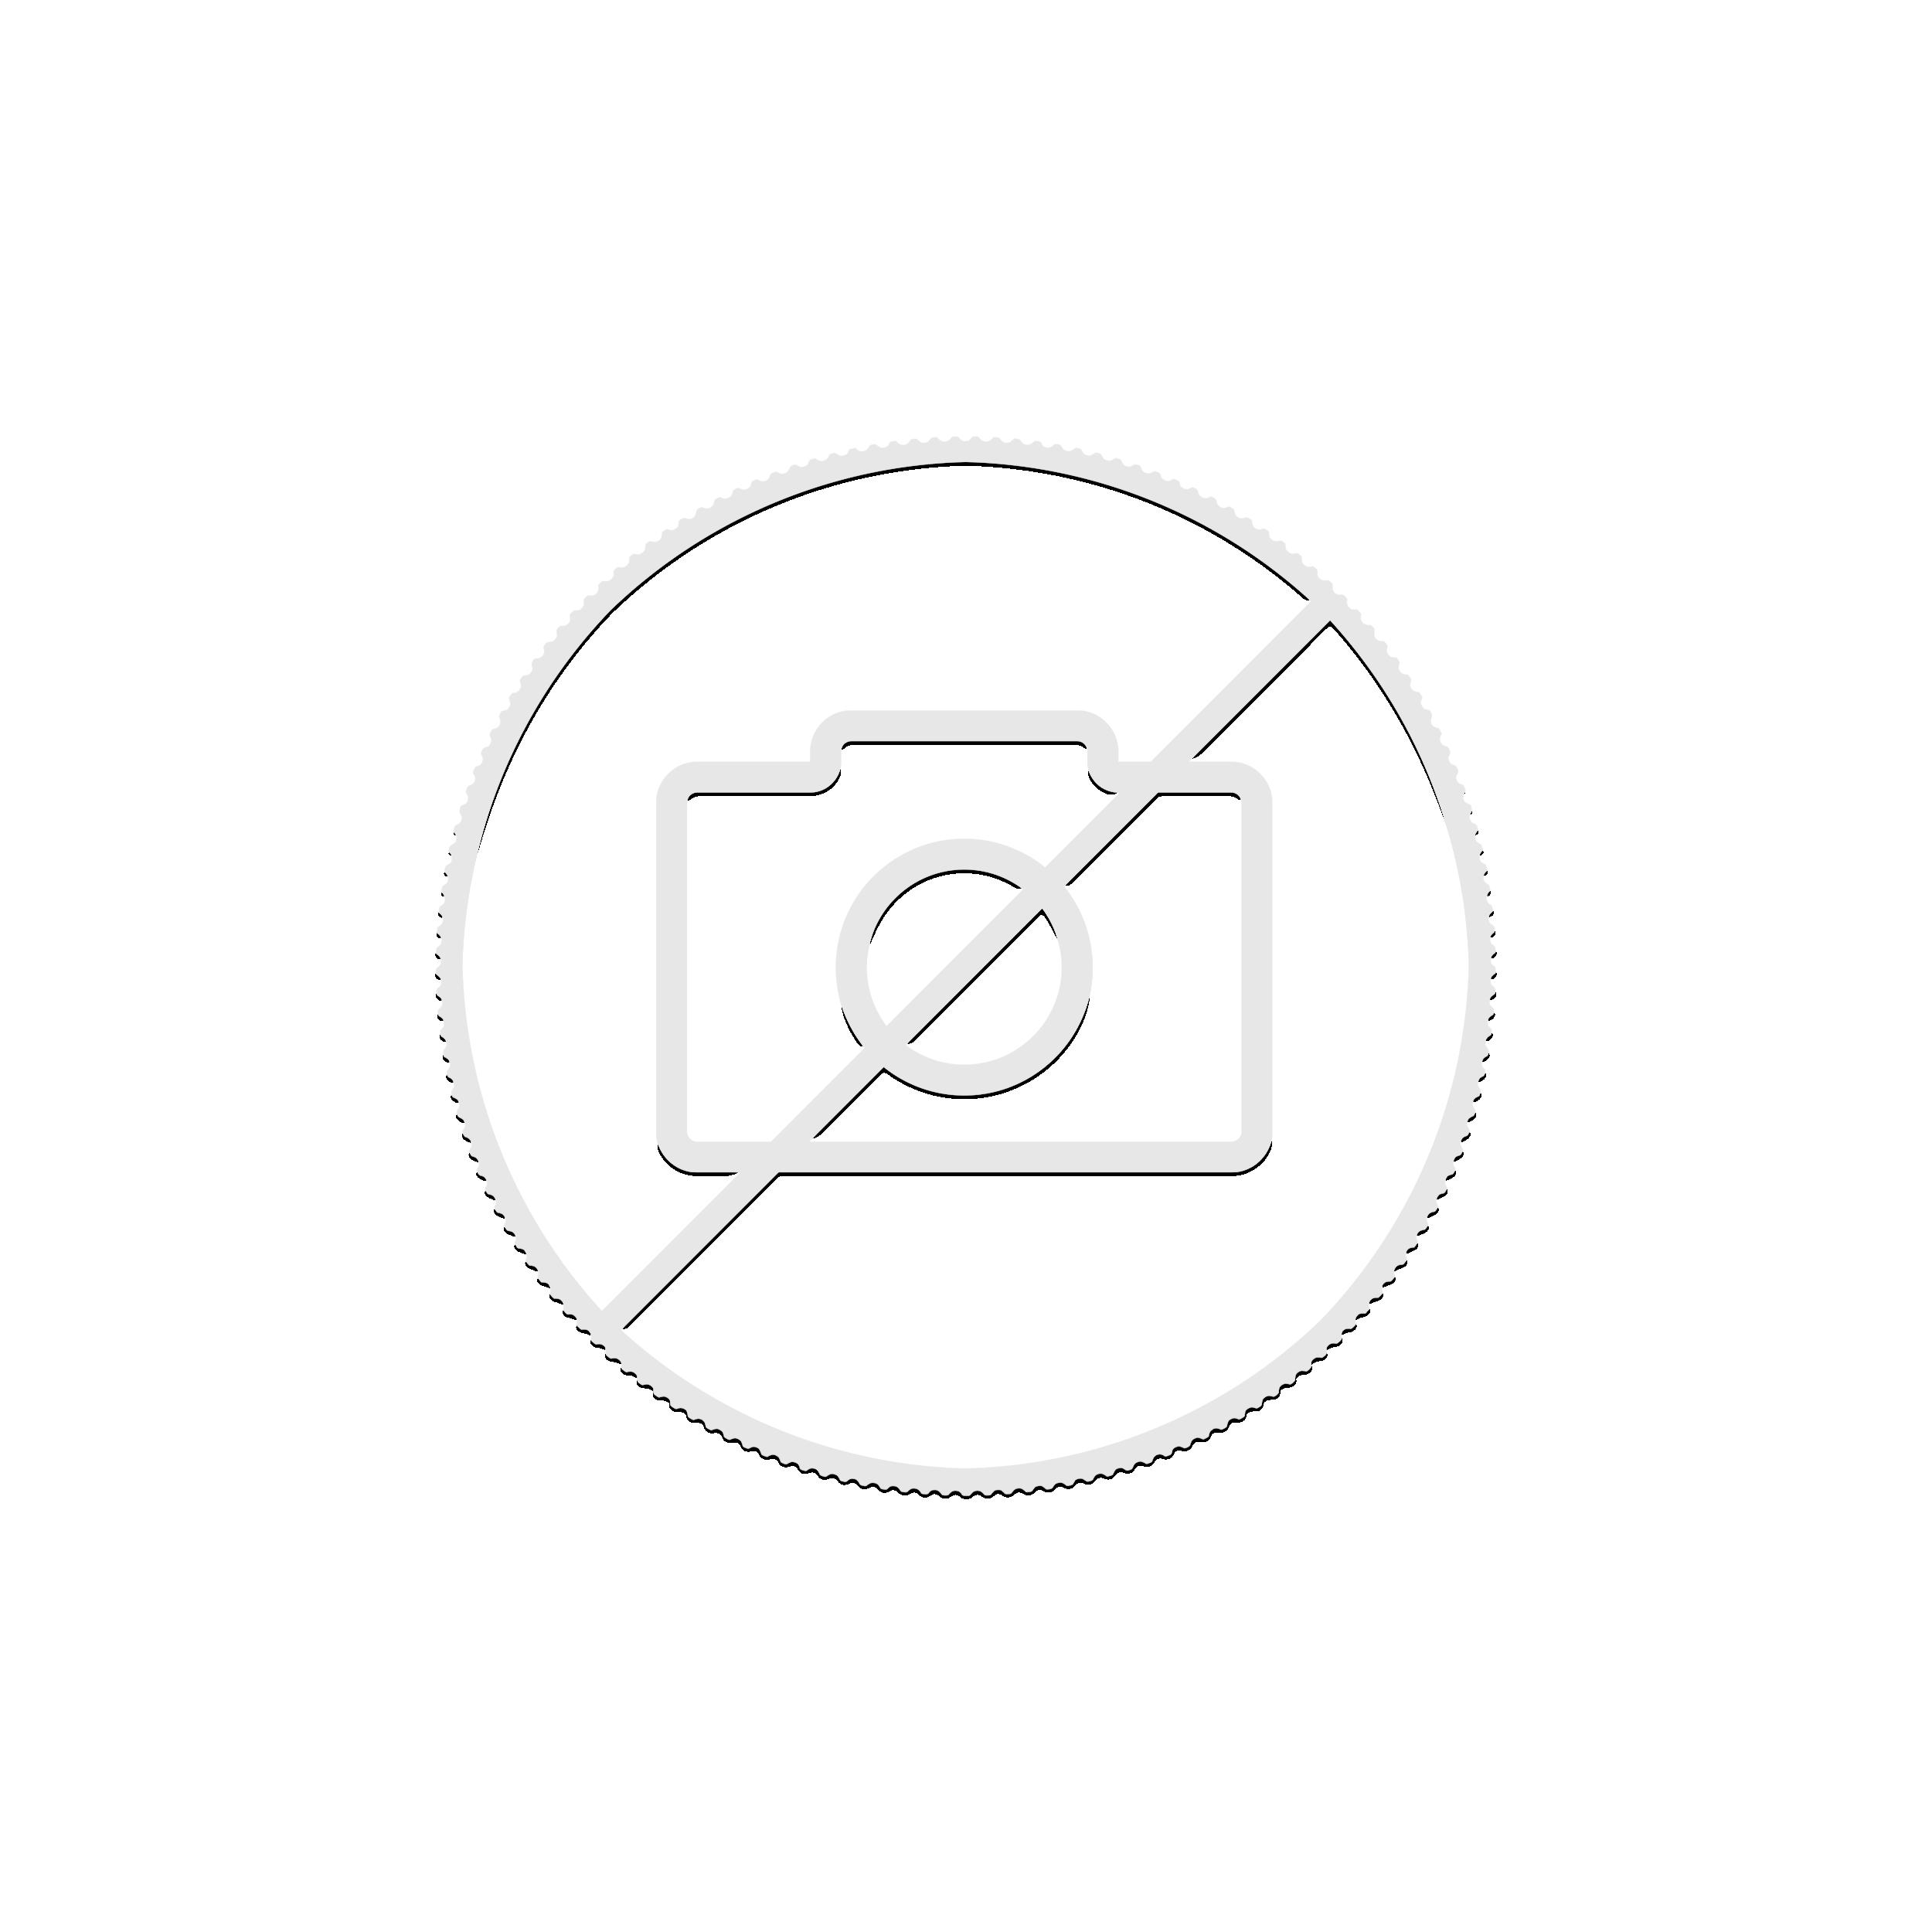 1 troy ounce zilveren munten set Cameleon